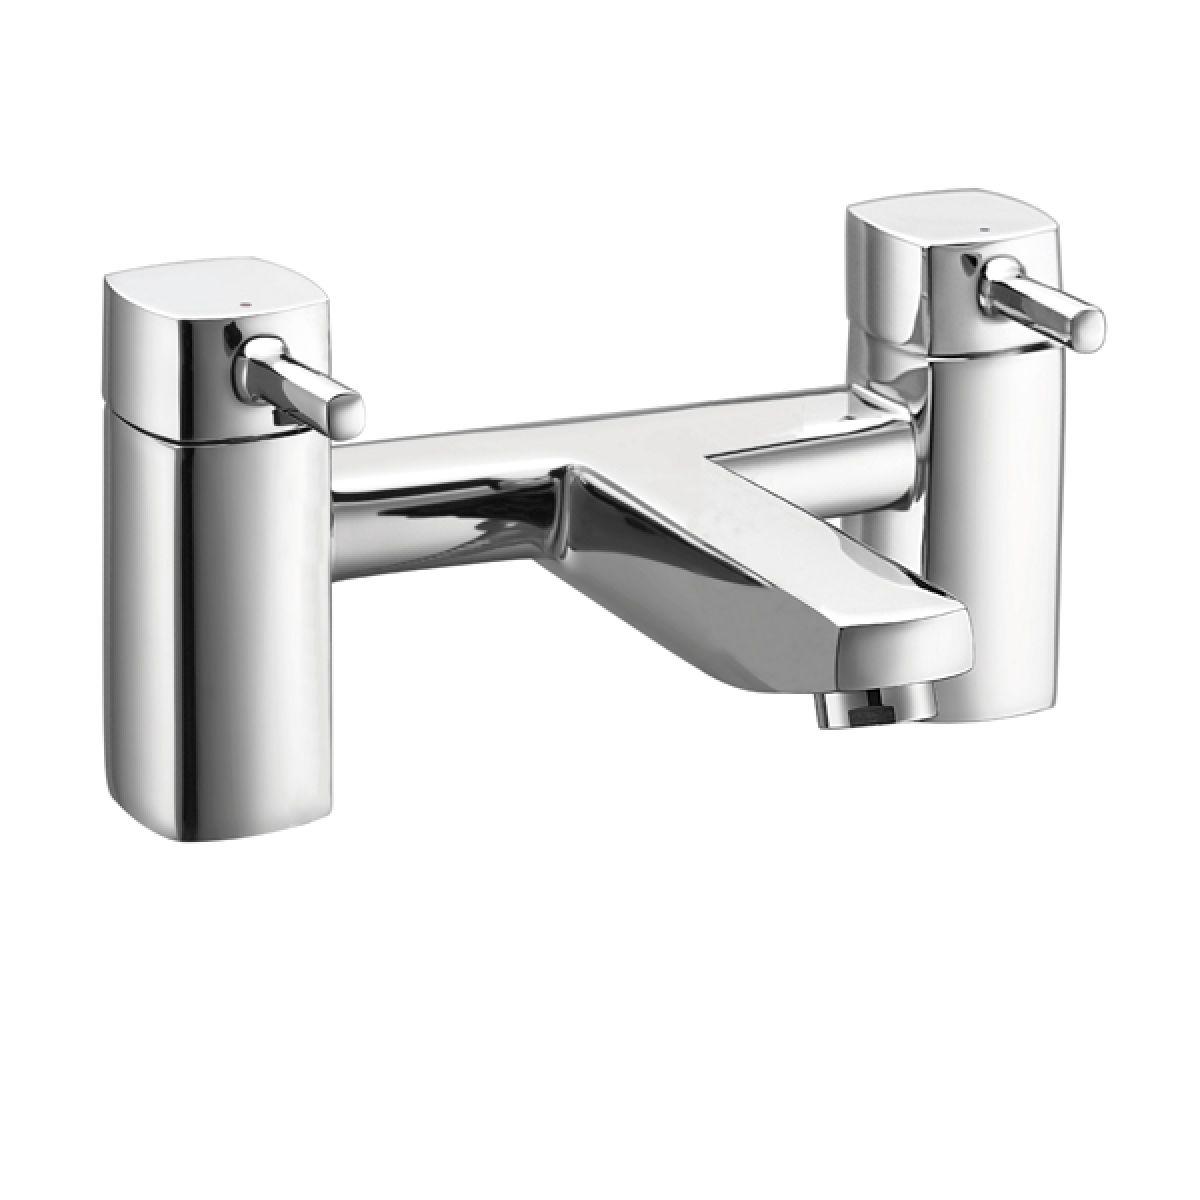 Frontline Cubix2 Bath Filler Tap